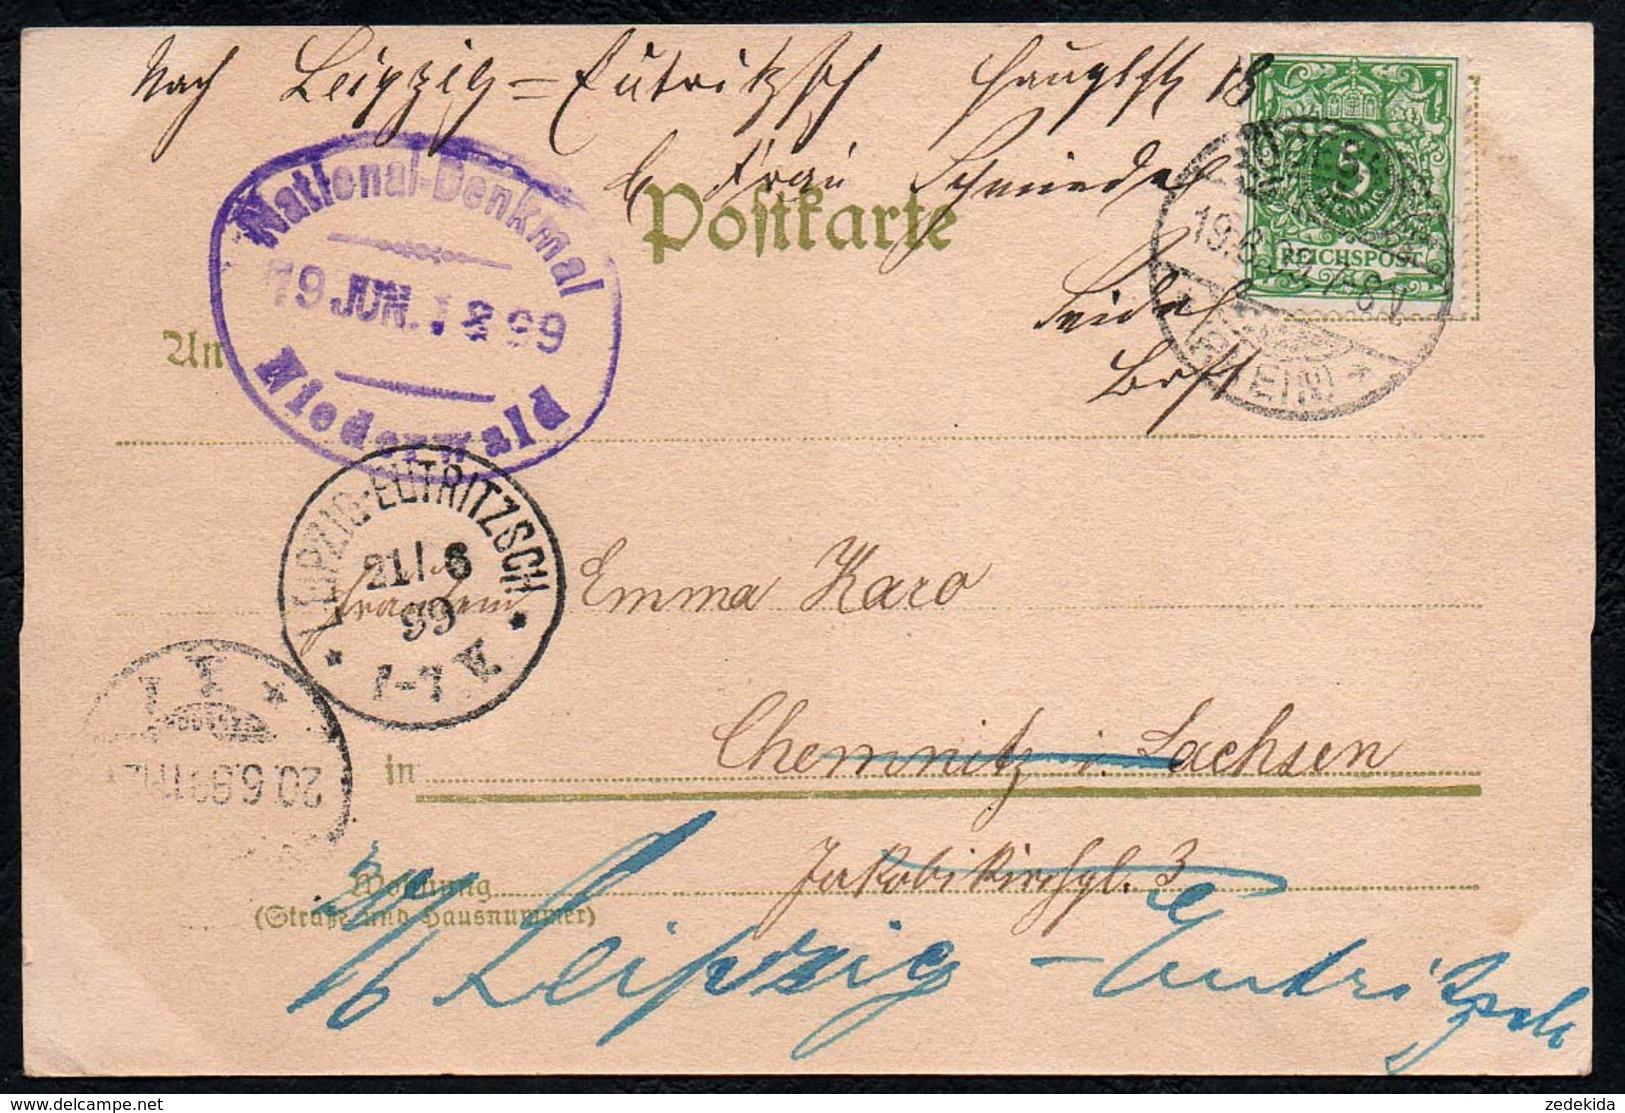 B5019 - National Denkmal Niederwald -  Johannes Schilling - F.&O. Brockmann Dresden - Monuments